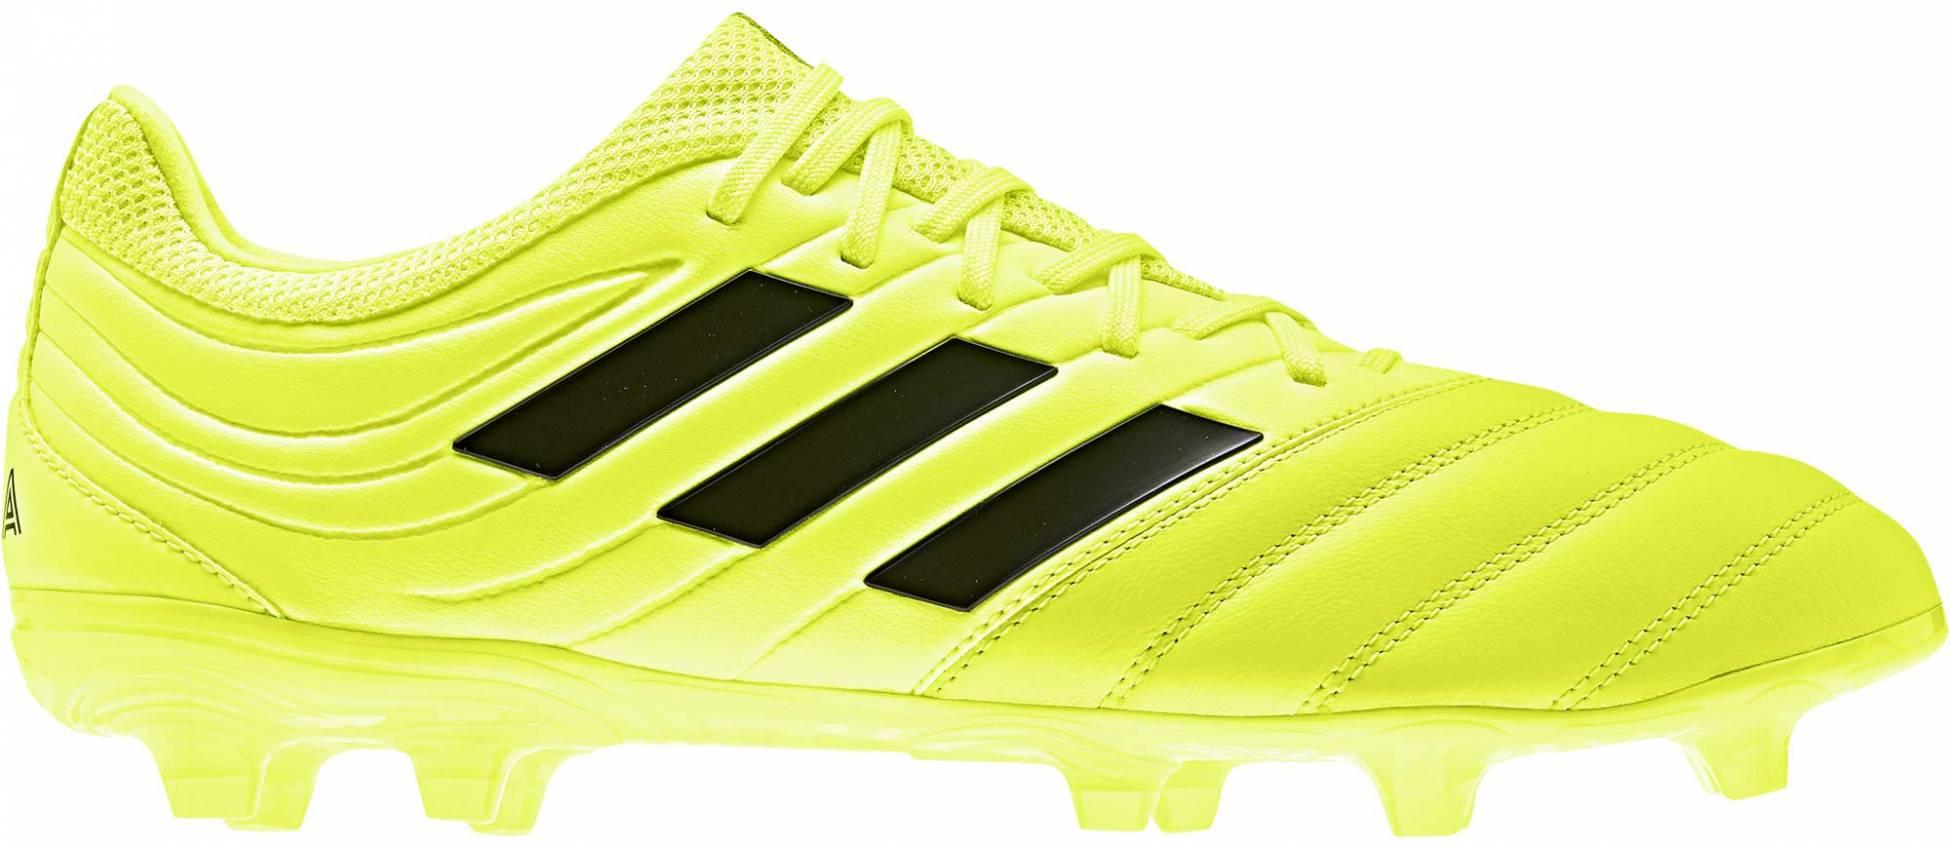 adidas chaussure jaune fluo